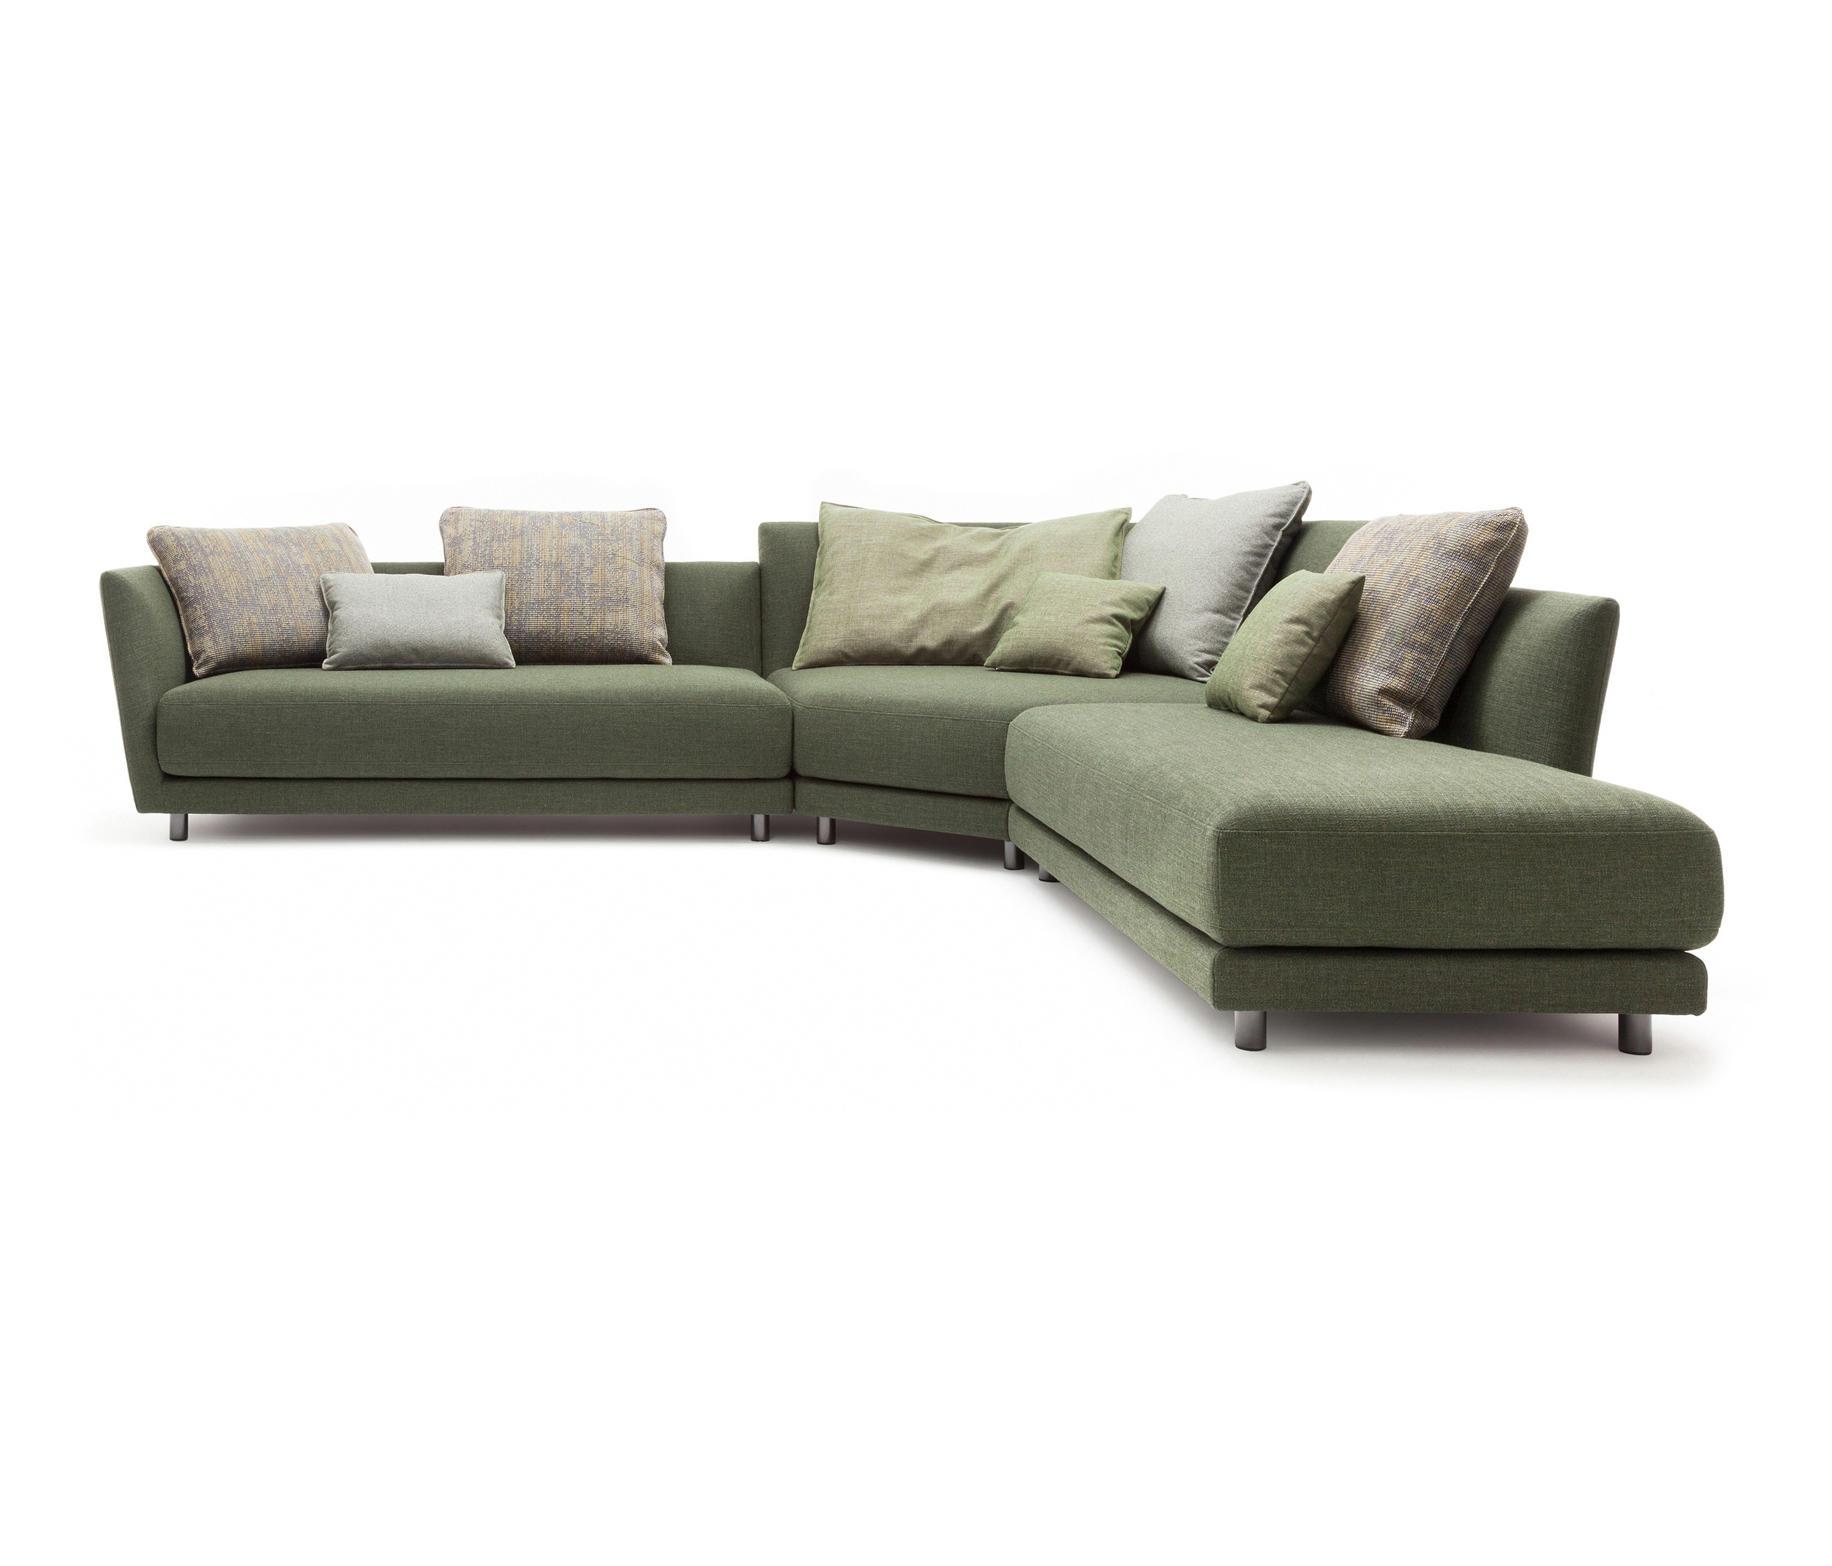 rolf benz tondo modulare sitzgruppen von rolf benz. Black Bedroom Furniture Sets. Home Design Ideas